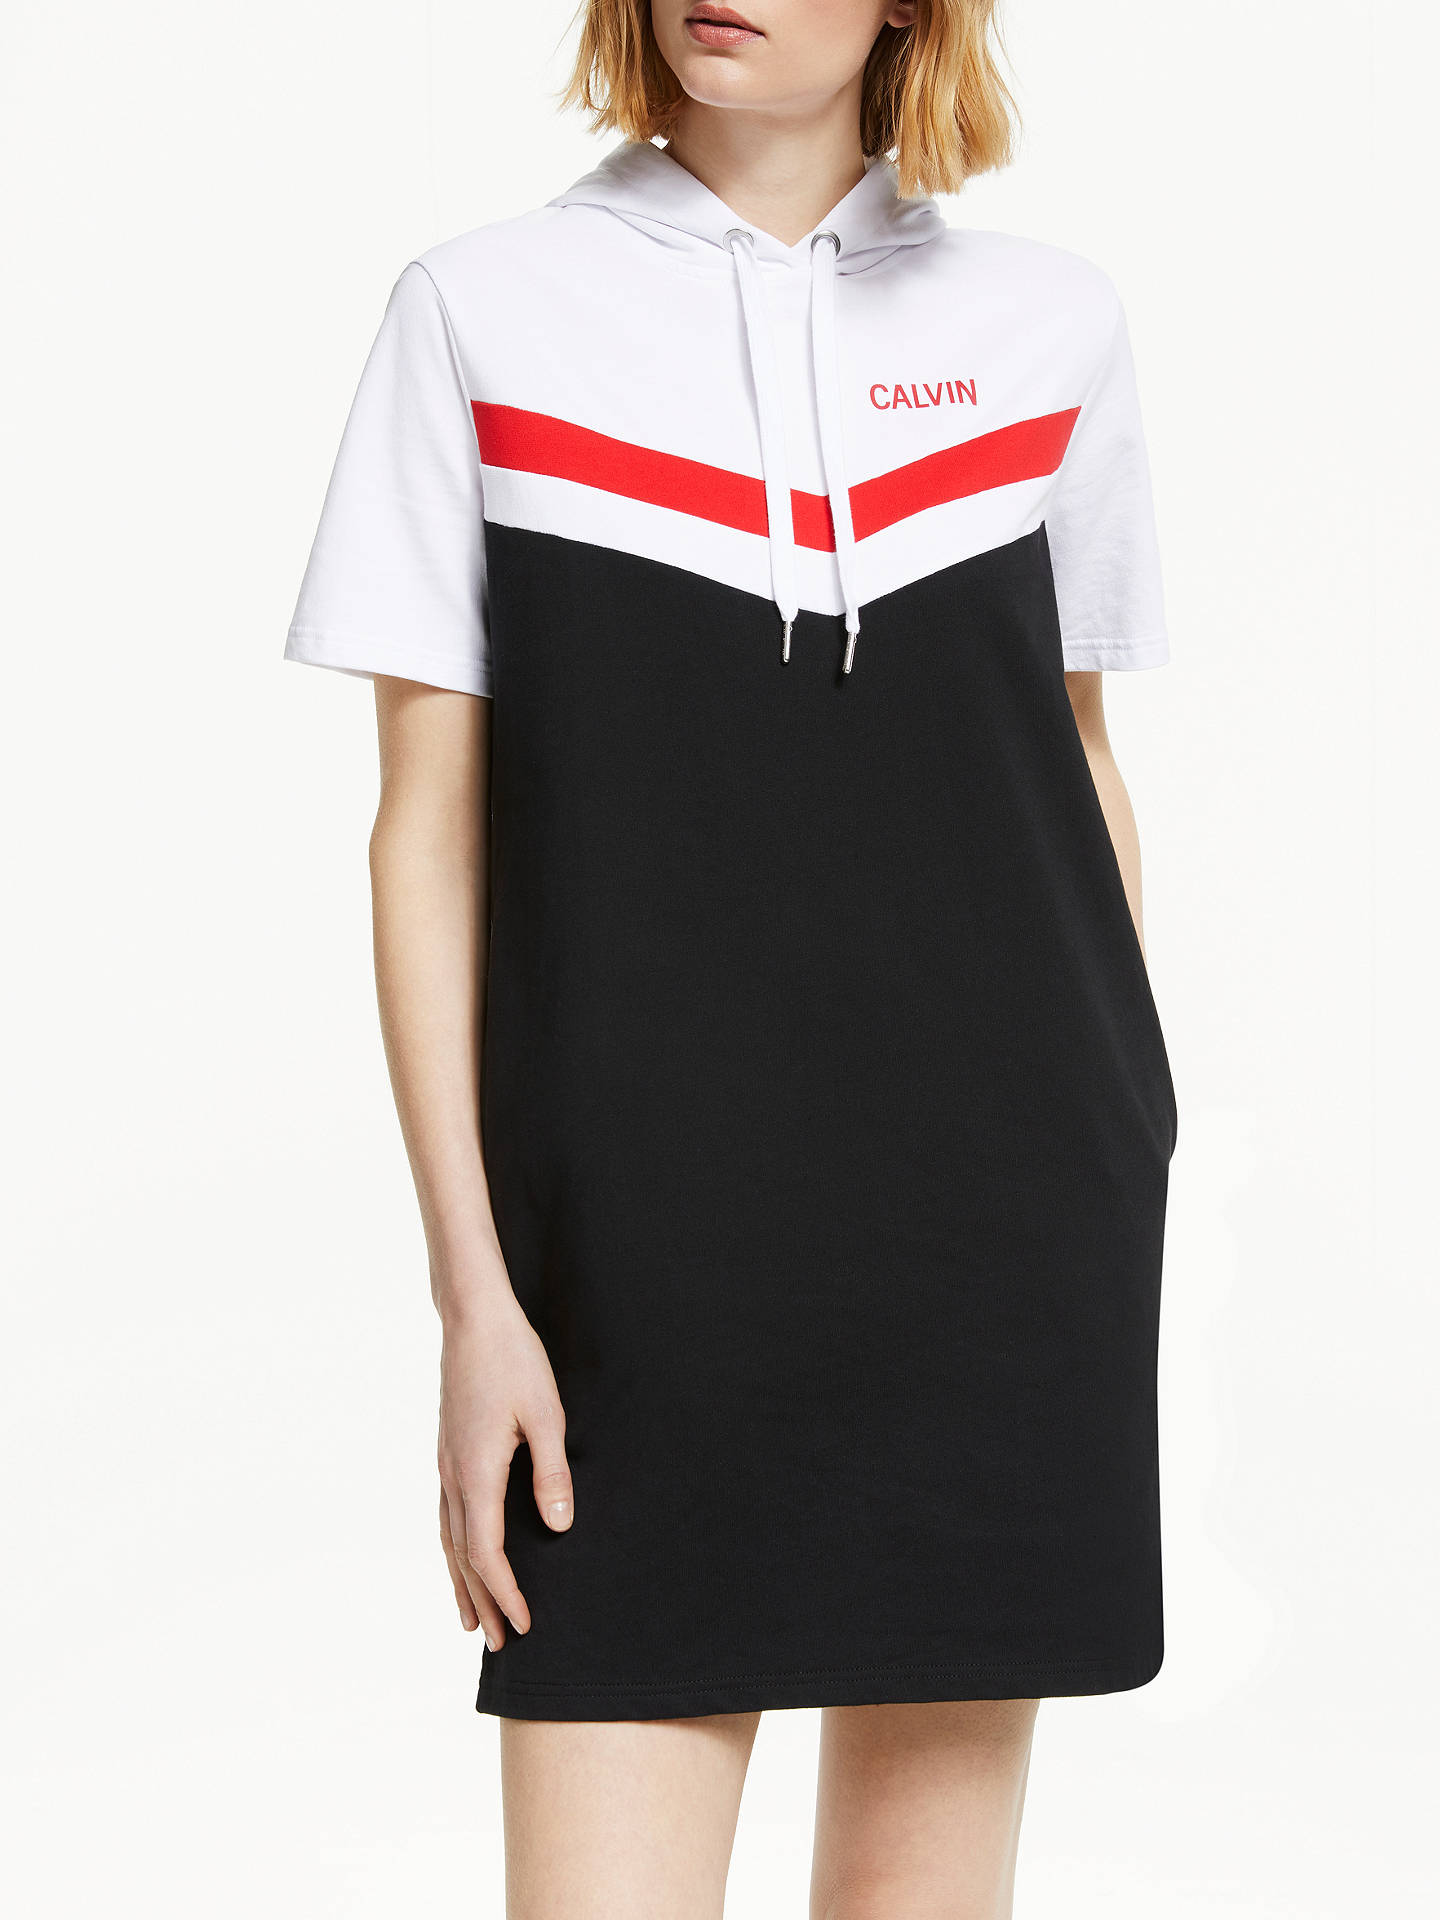 5f15b34b27db Buy Calvin Klein Jeans Cheerleader Colour Block Hooded Dress